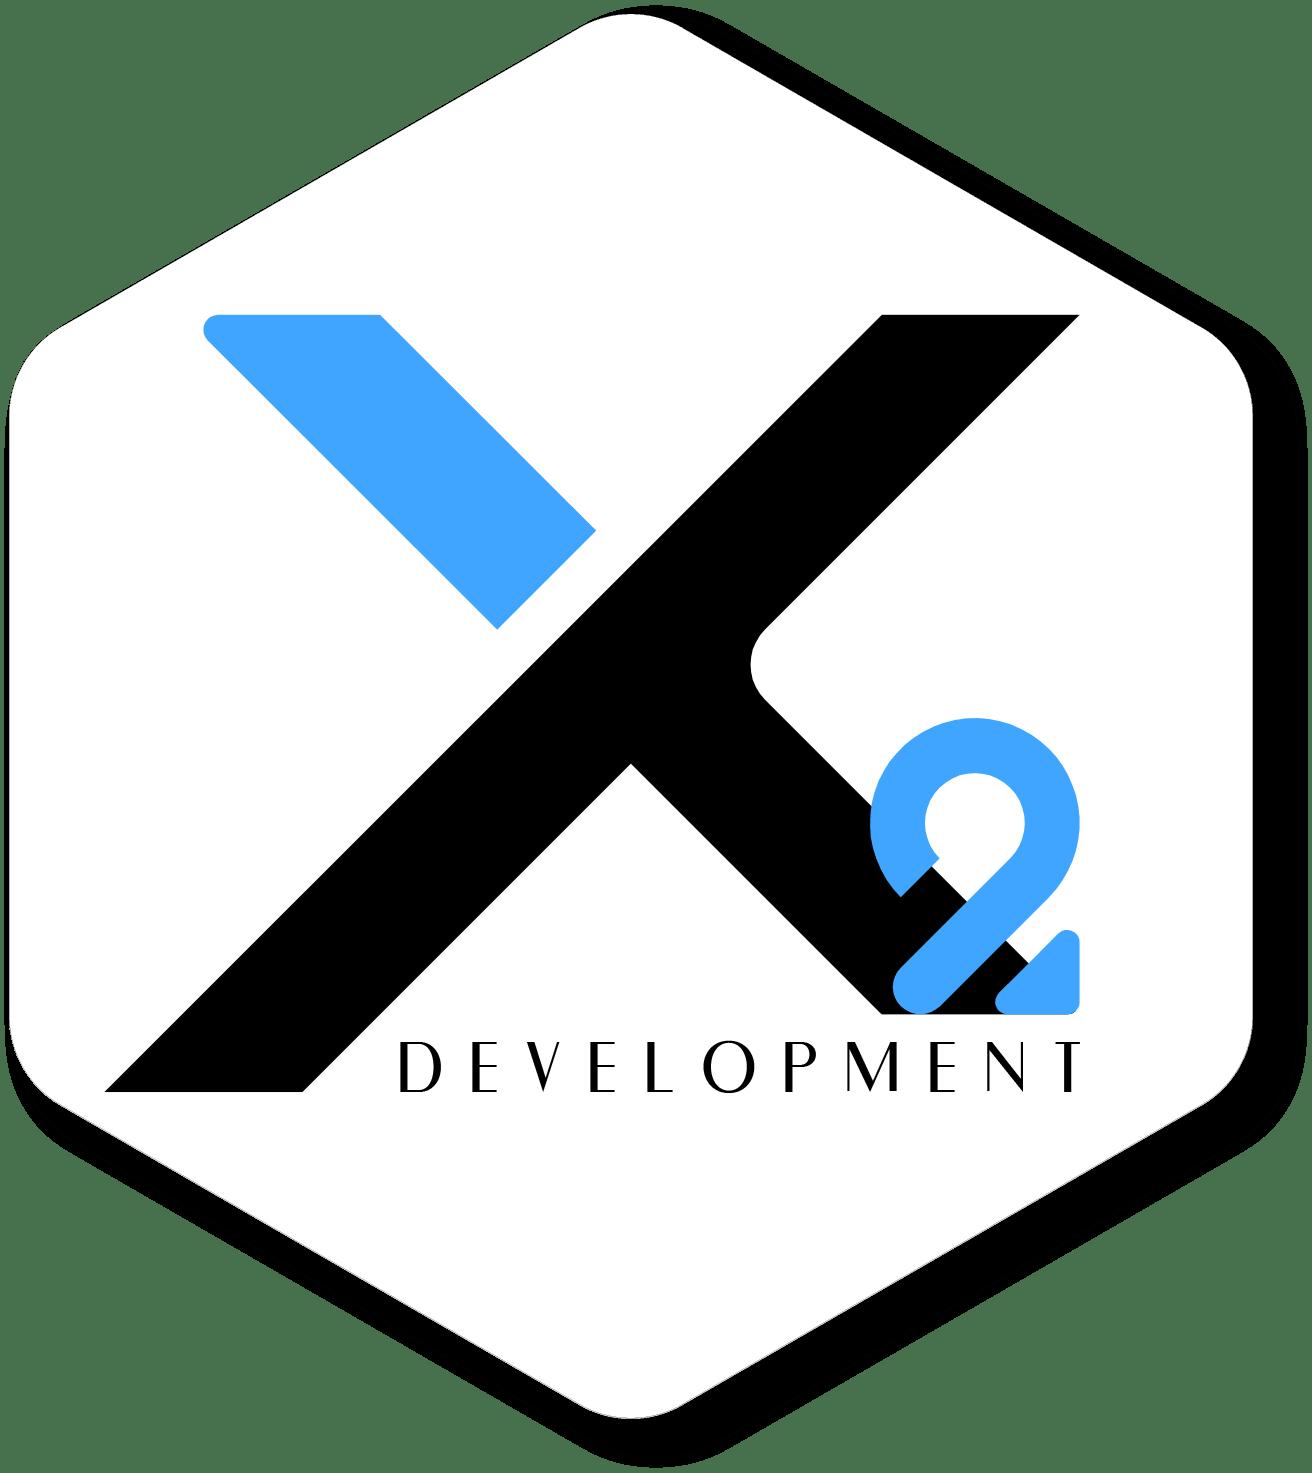 X2 - Development